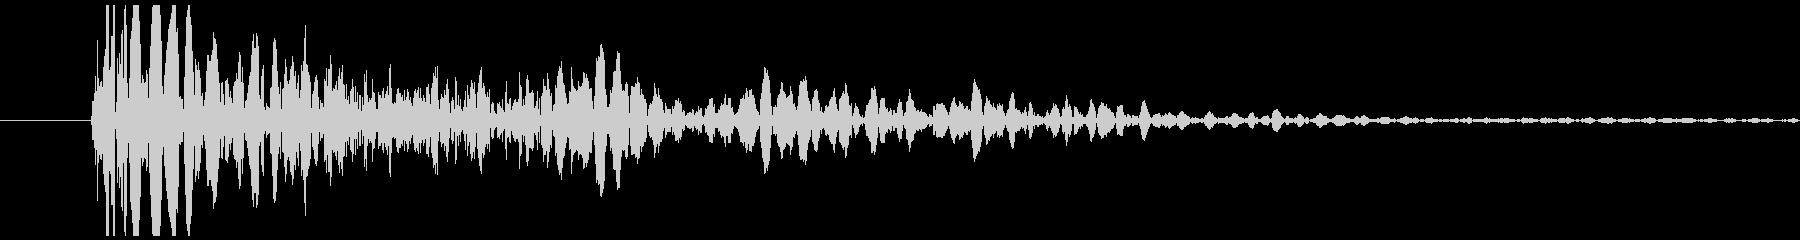 SFメカの足音の未再生の波形